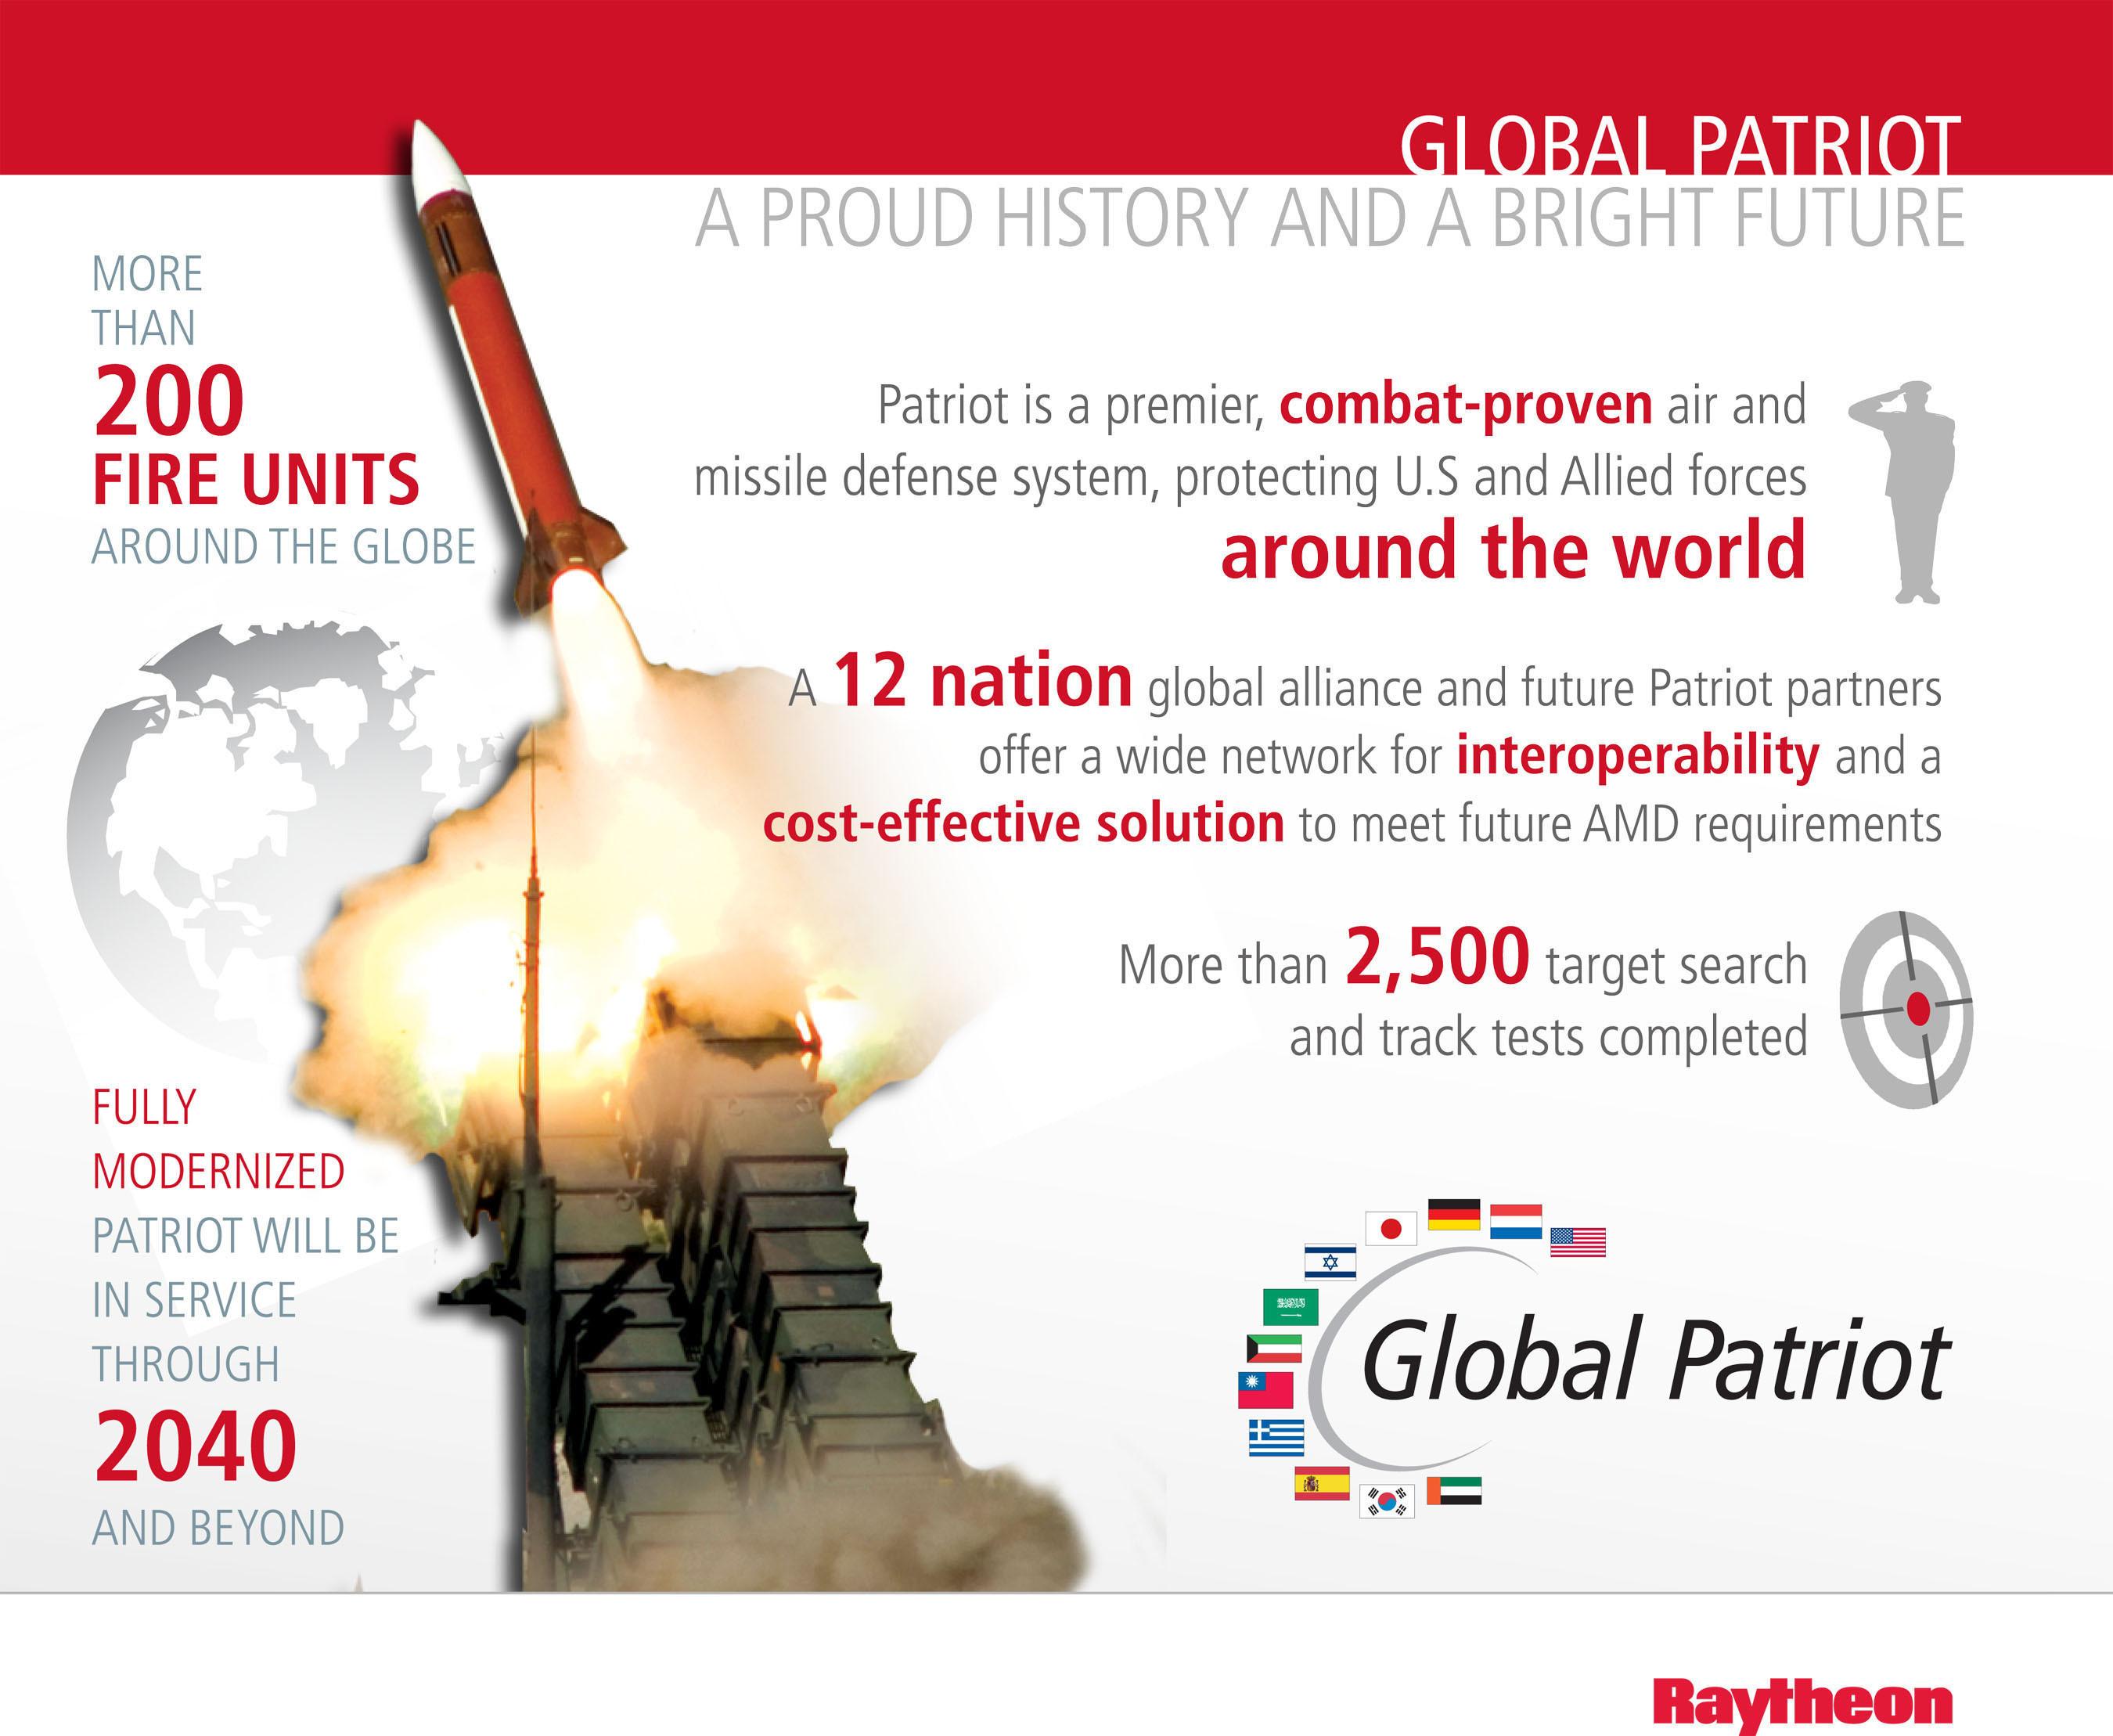 Combat Proven Patriot Missile Defense System. (PRNewsFoto/Raytheon Company) (PRNewsFoto/RAYTHEON COMPANY)